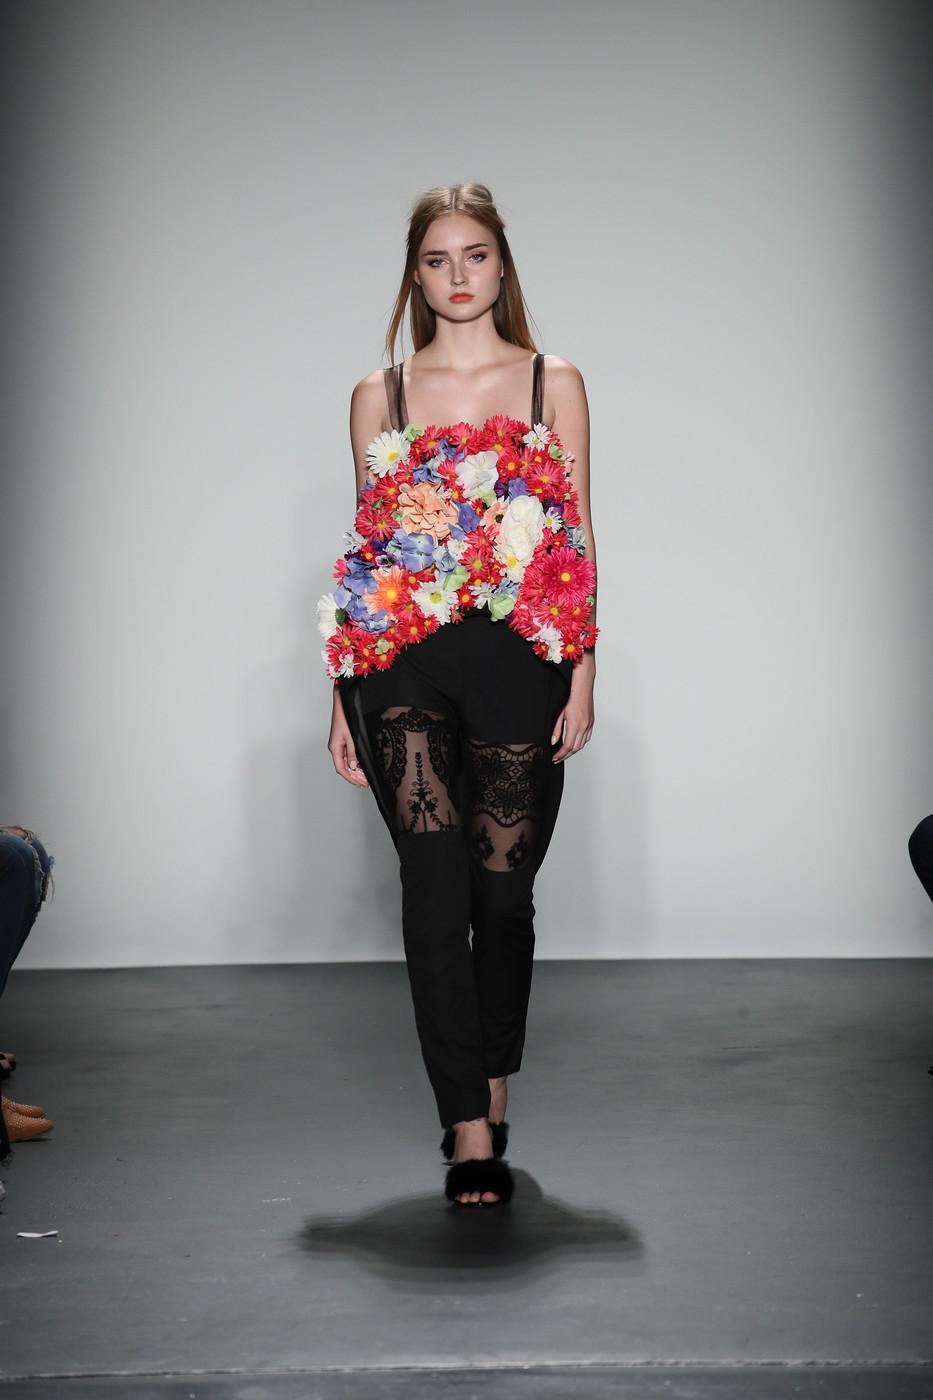 Fashion Designer Donatella Versace s Daughter Battling Anorexia Fashion designer daughter anorexia